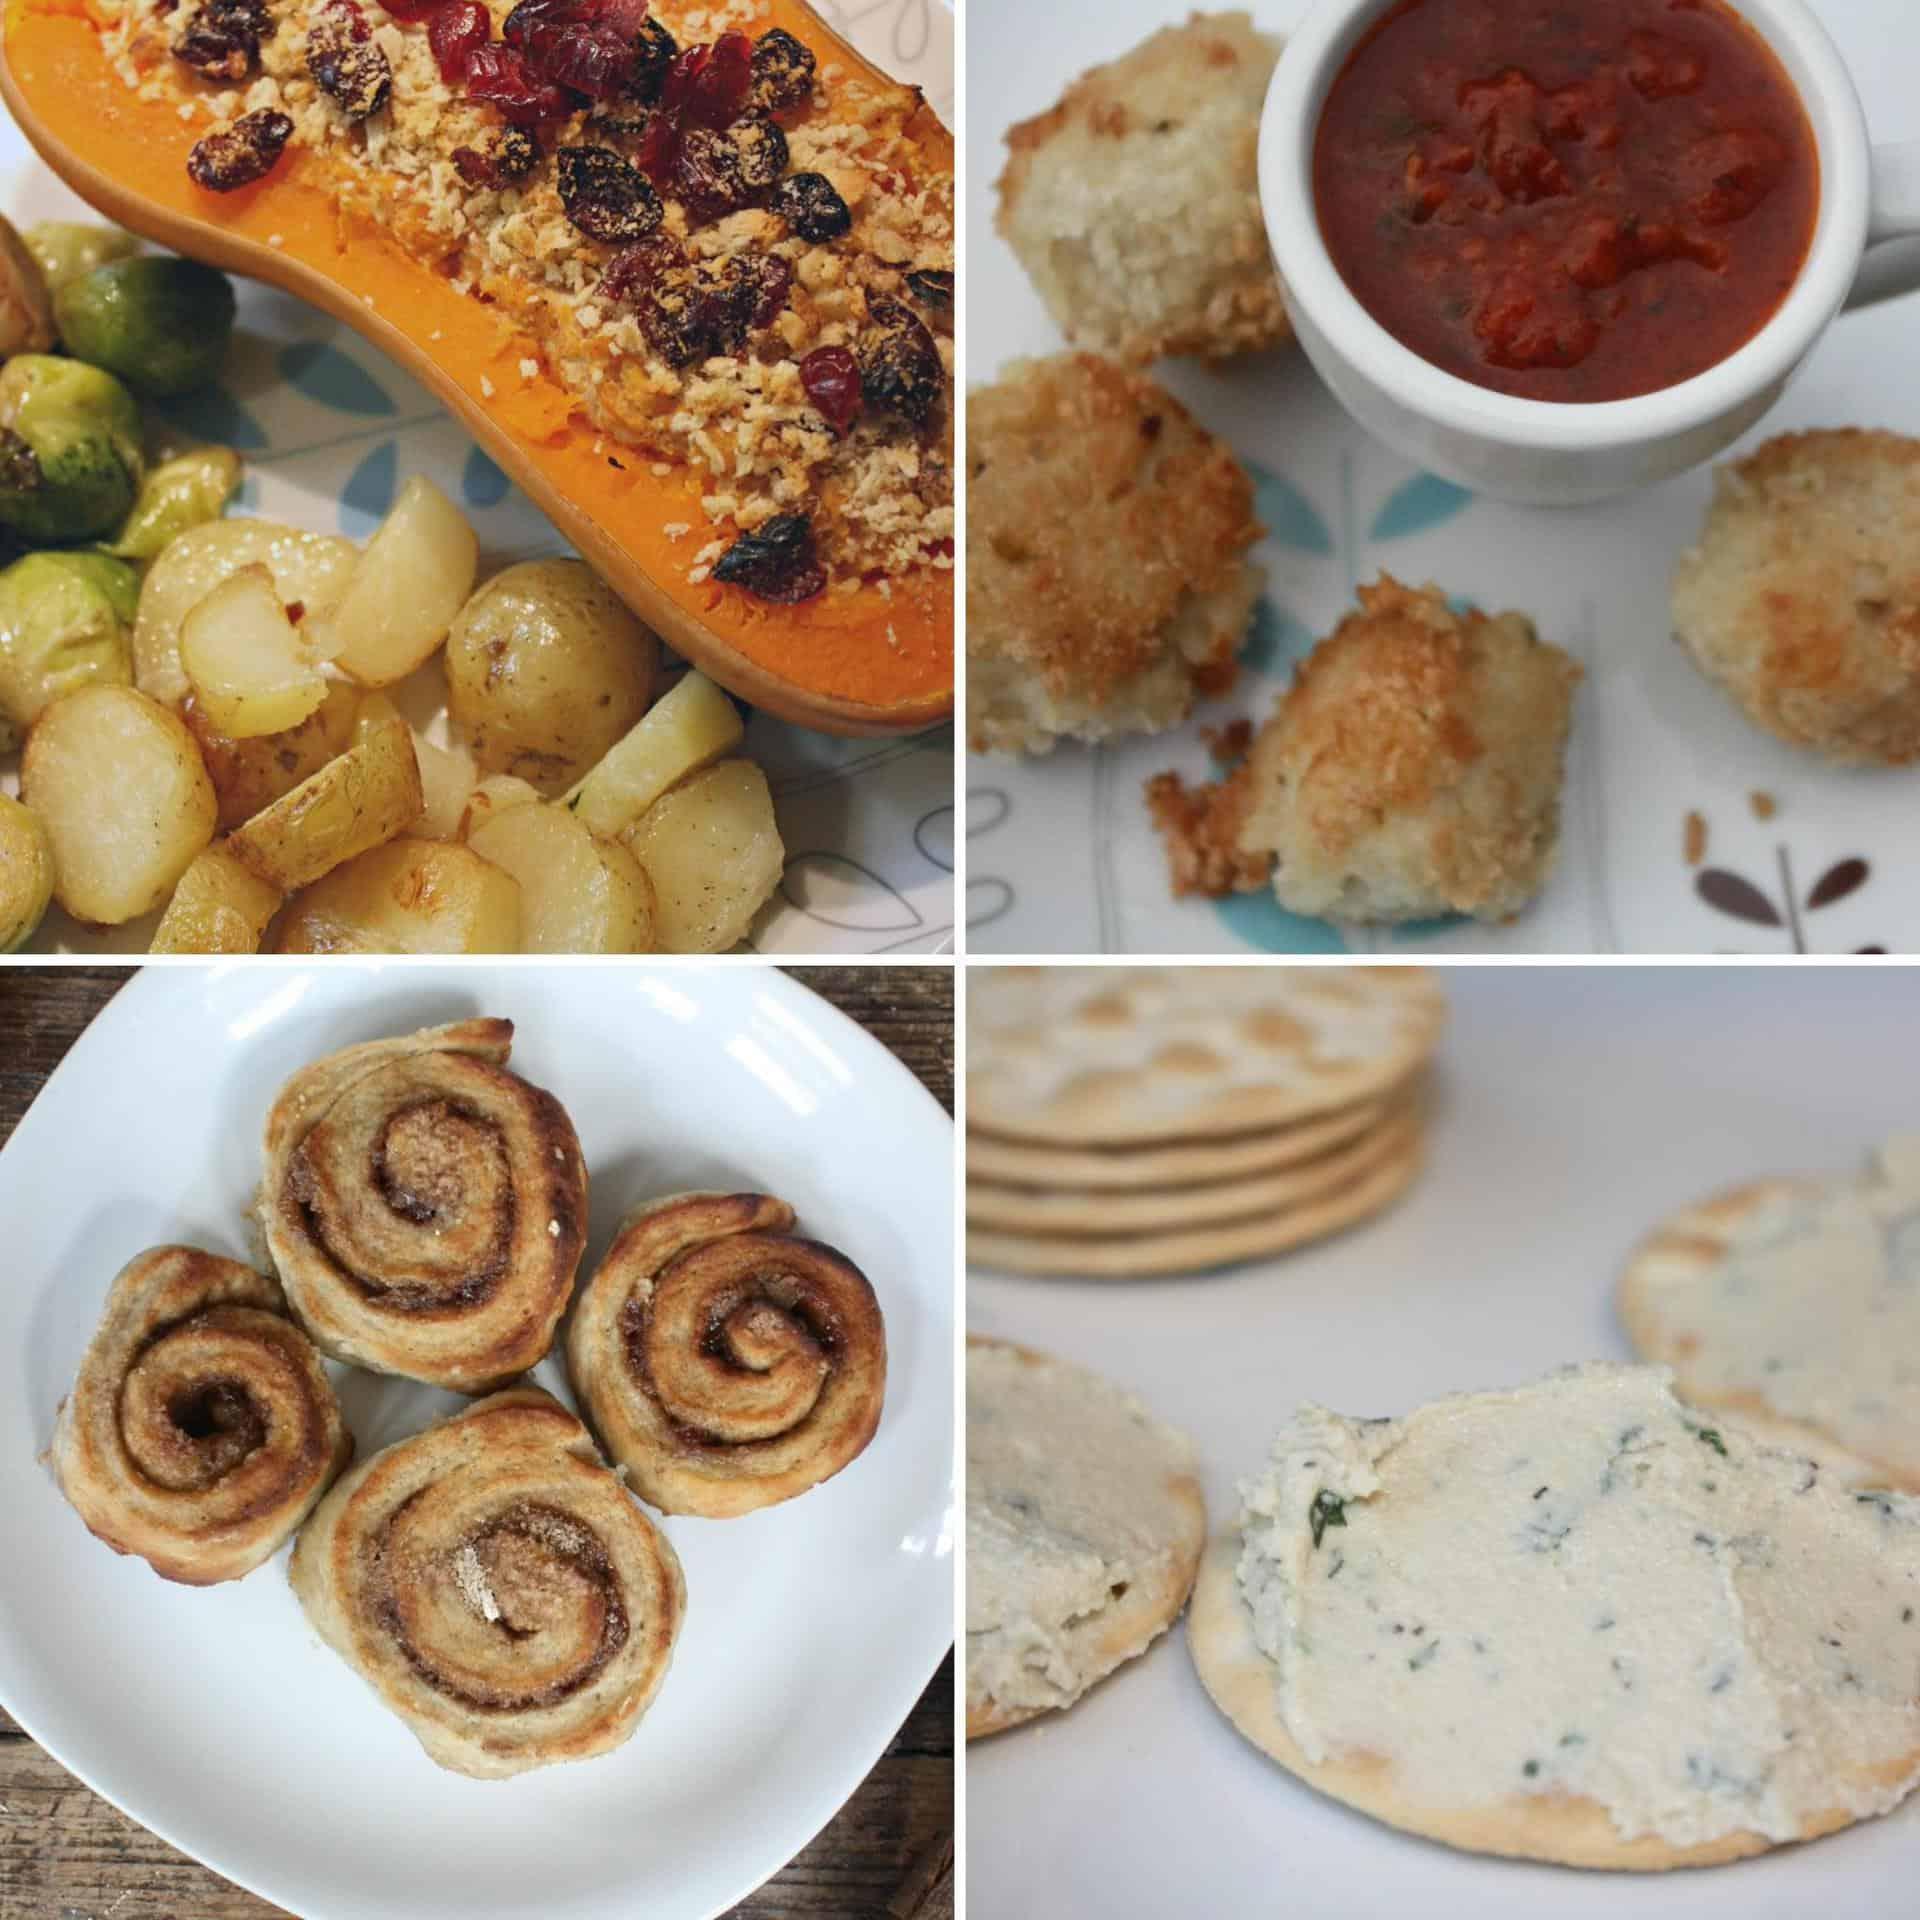 Vegan Christmas Dishes